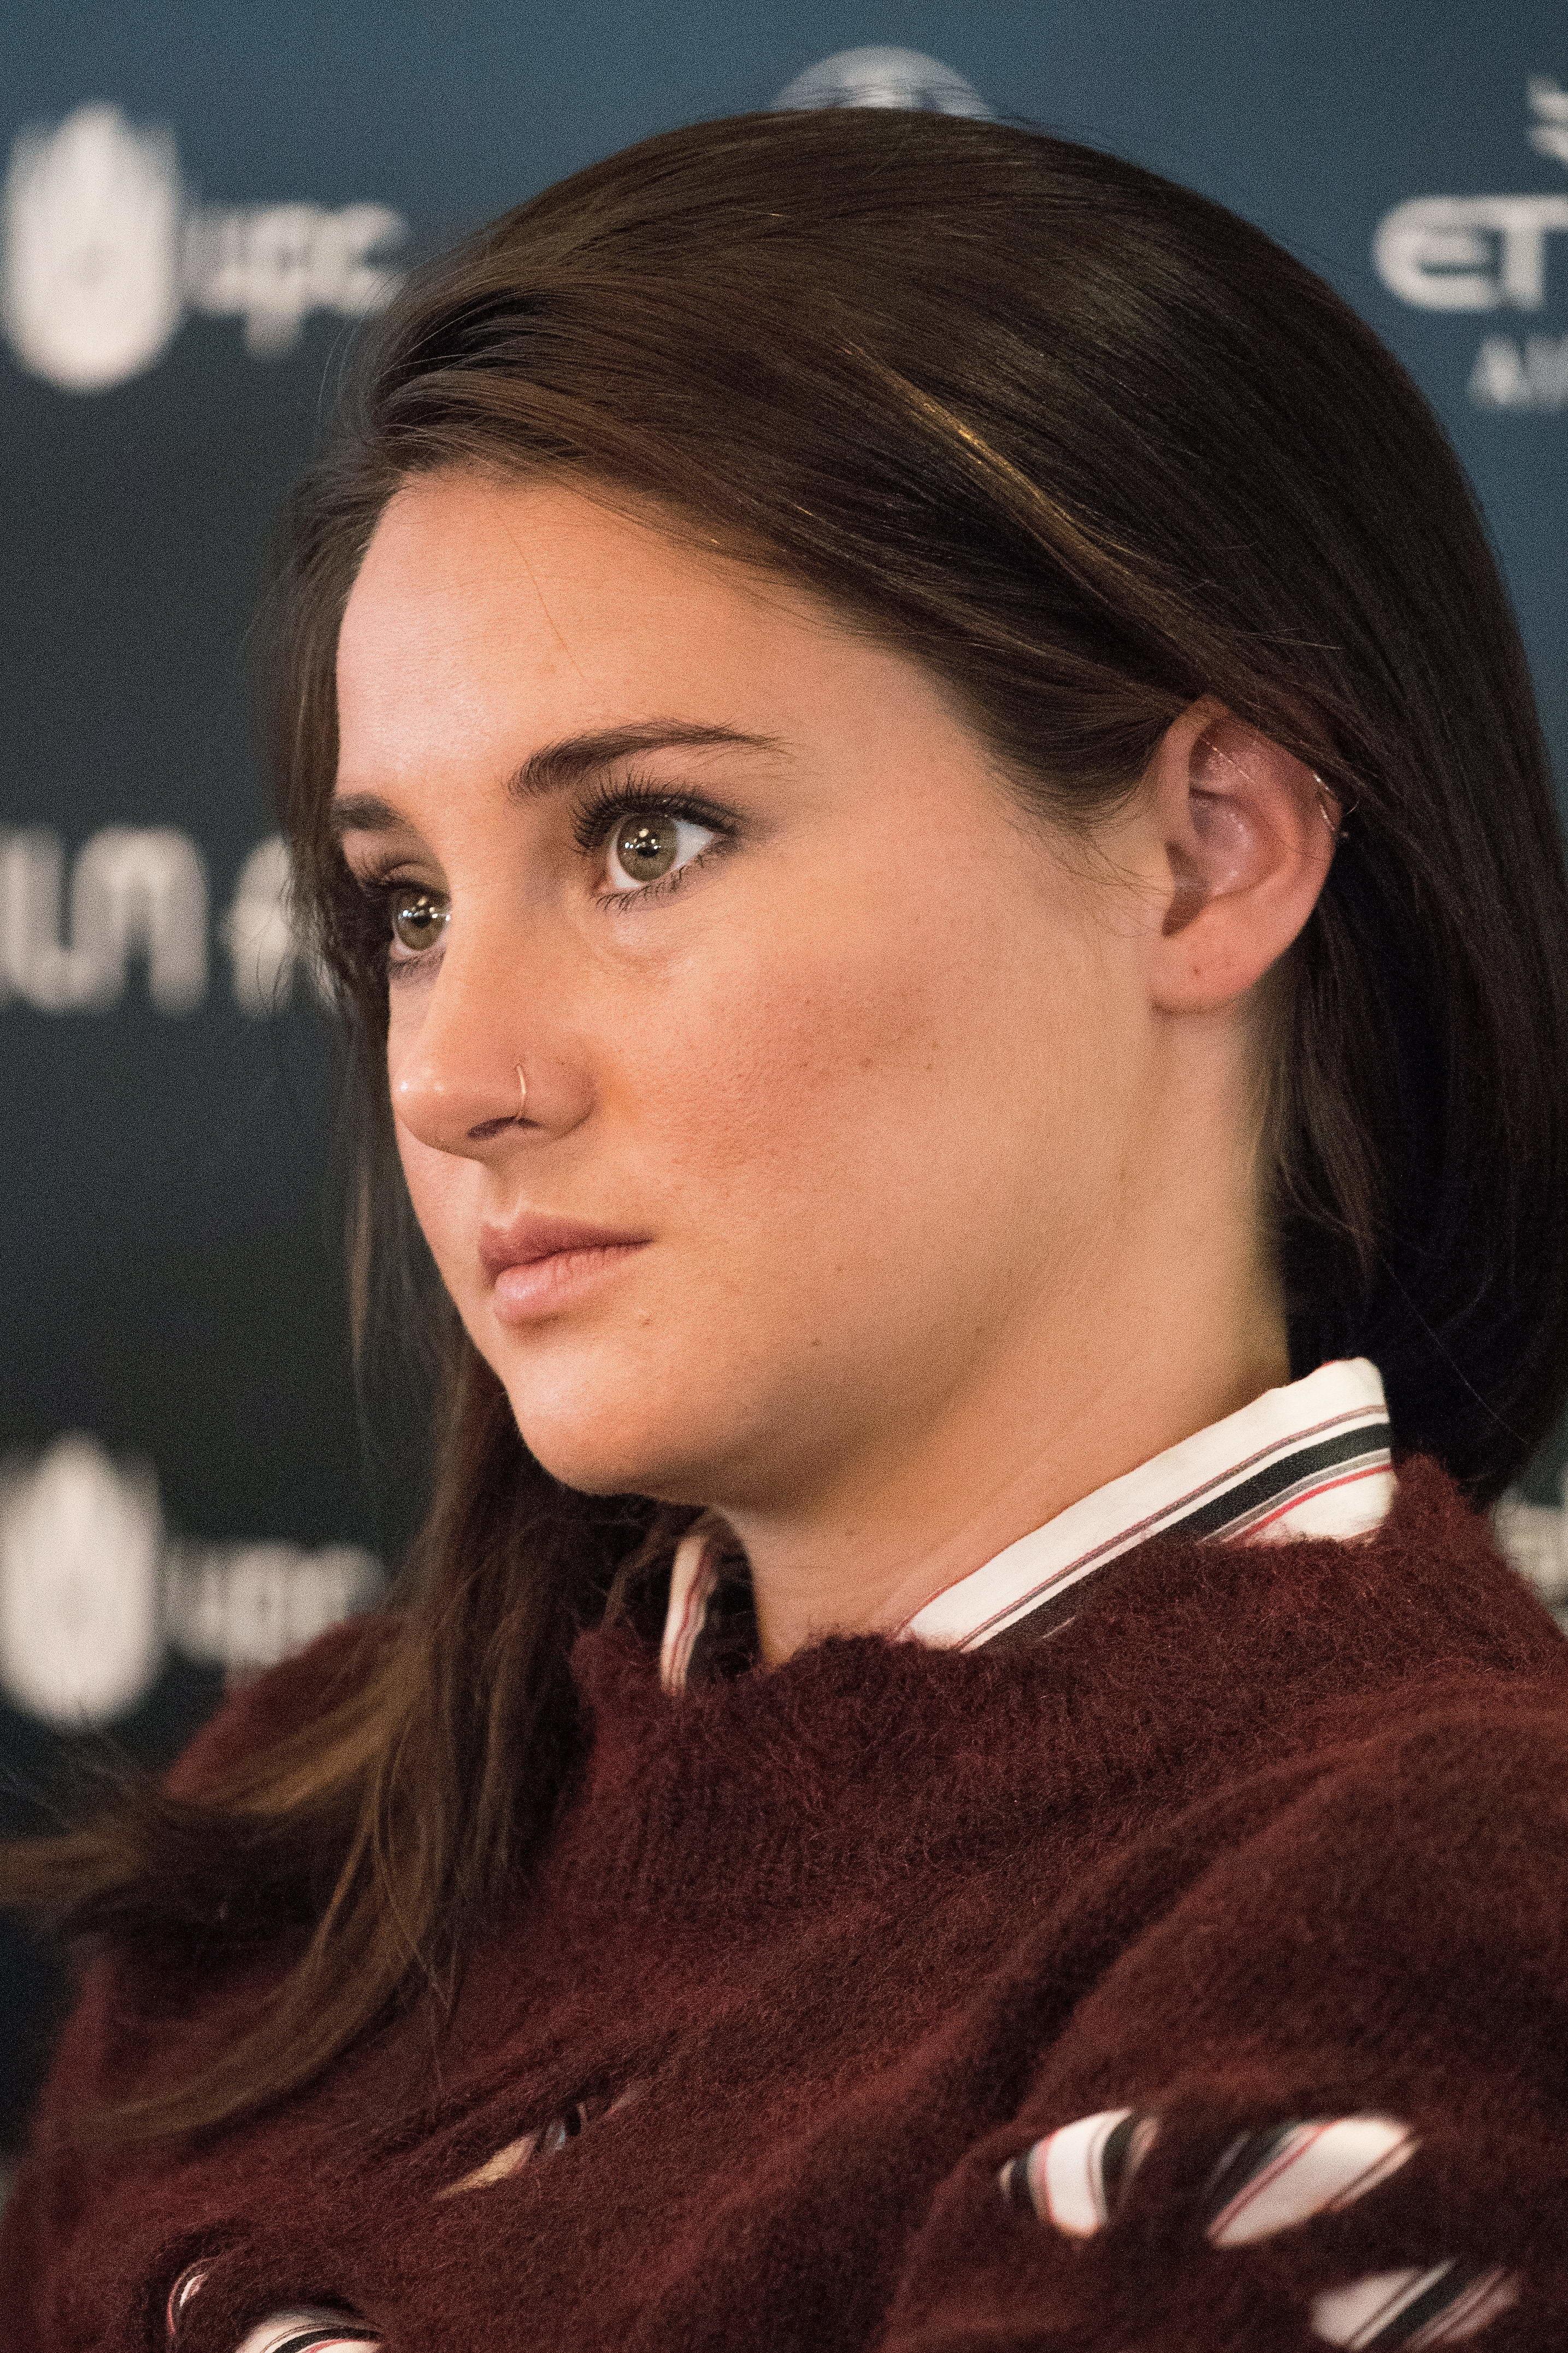 Beautiful Shailene Woodley